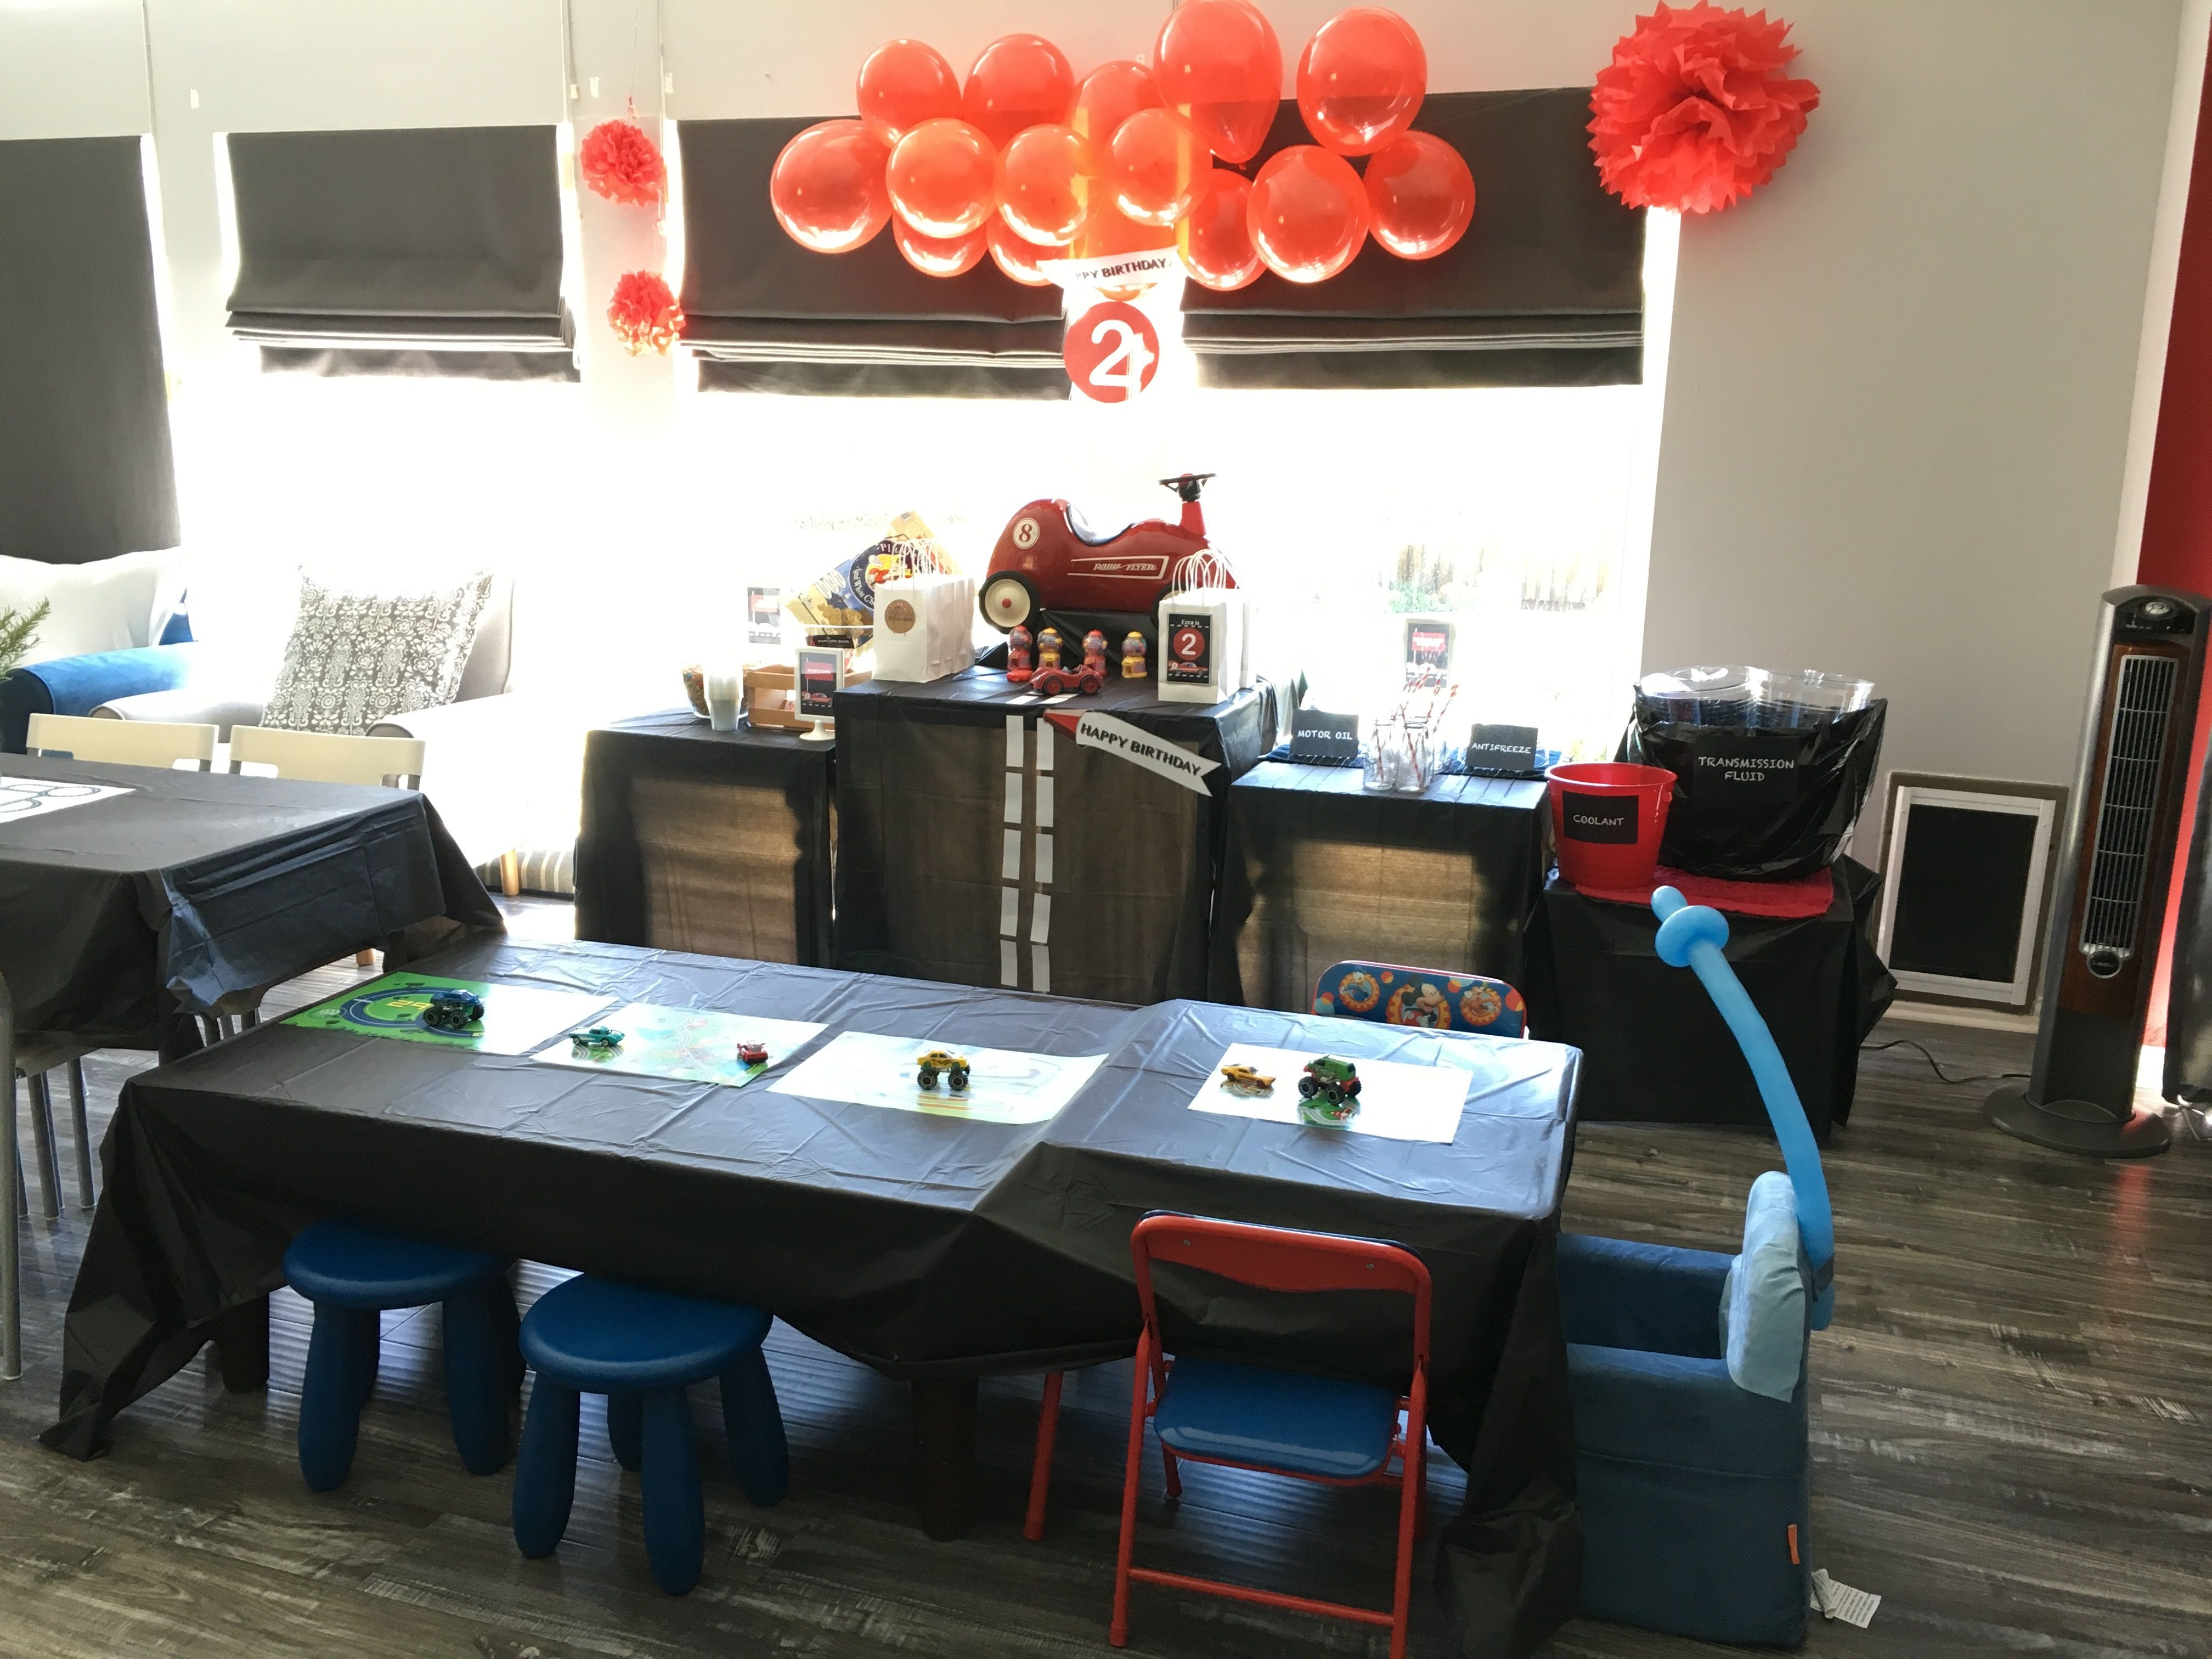 Retro Race Car Theme Birthday Party   Simple Kids Table Setting Using Black  Vinyl Table Cover